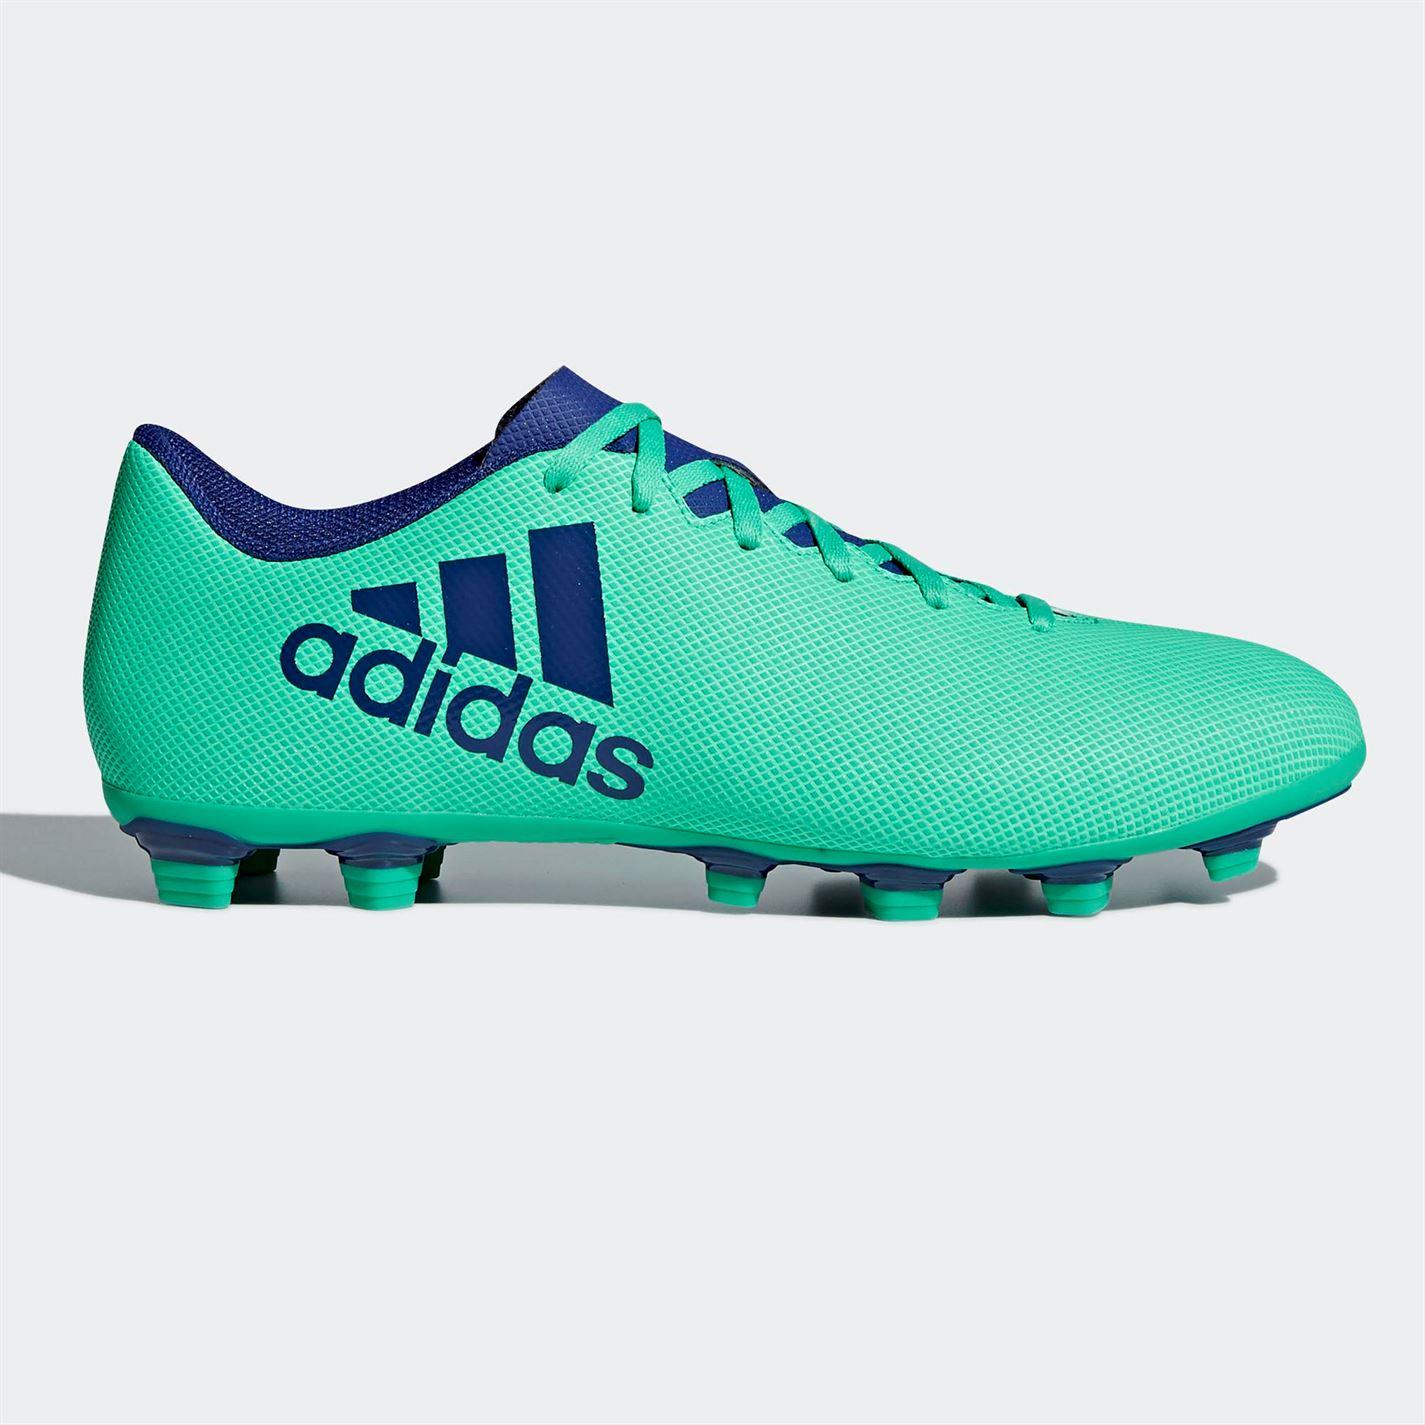 Adidas X 17.4 Mens FG Football Boots